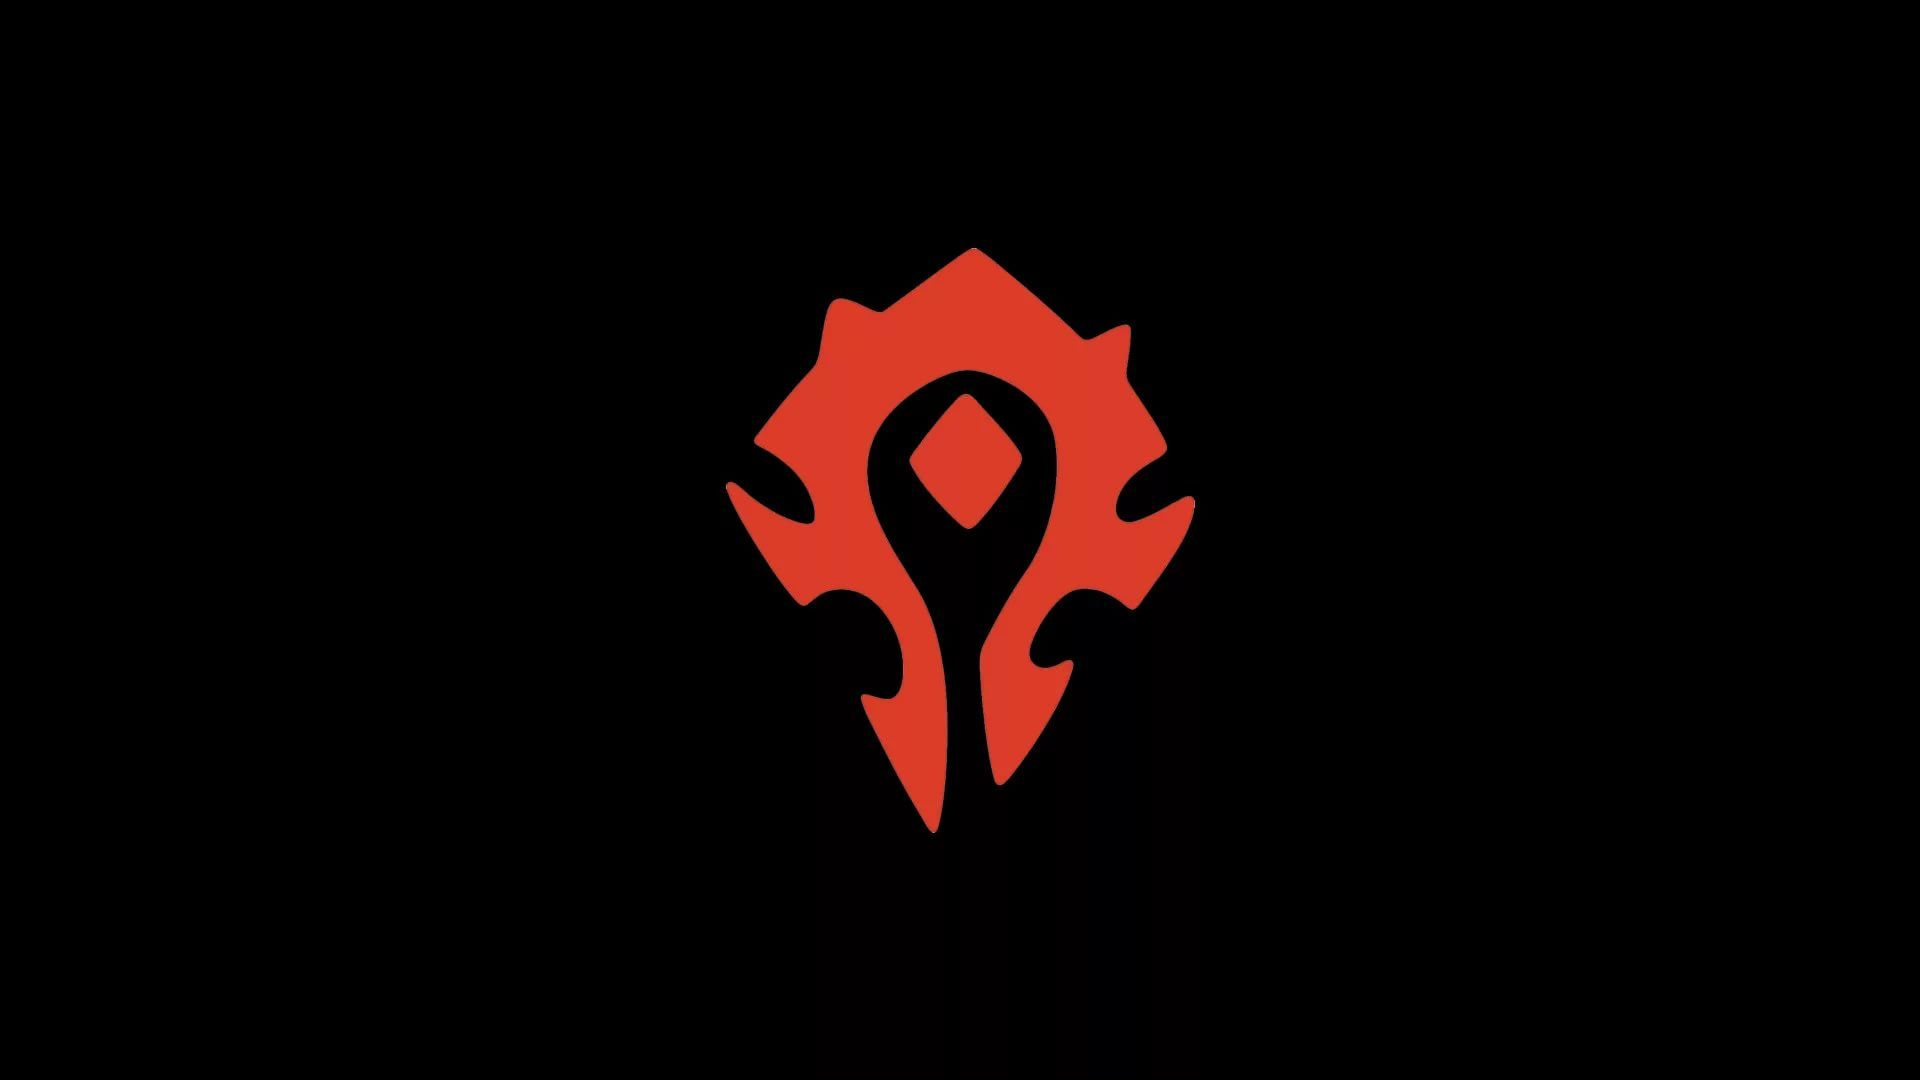 Horde Logo desktop wallpaper